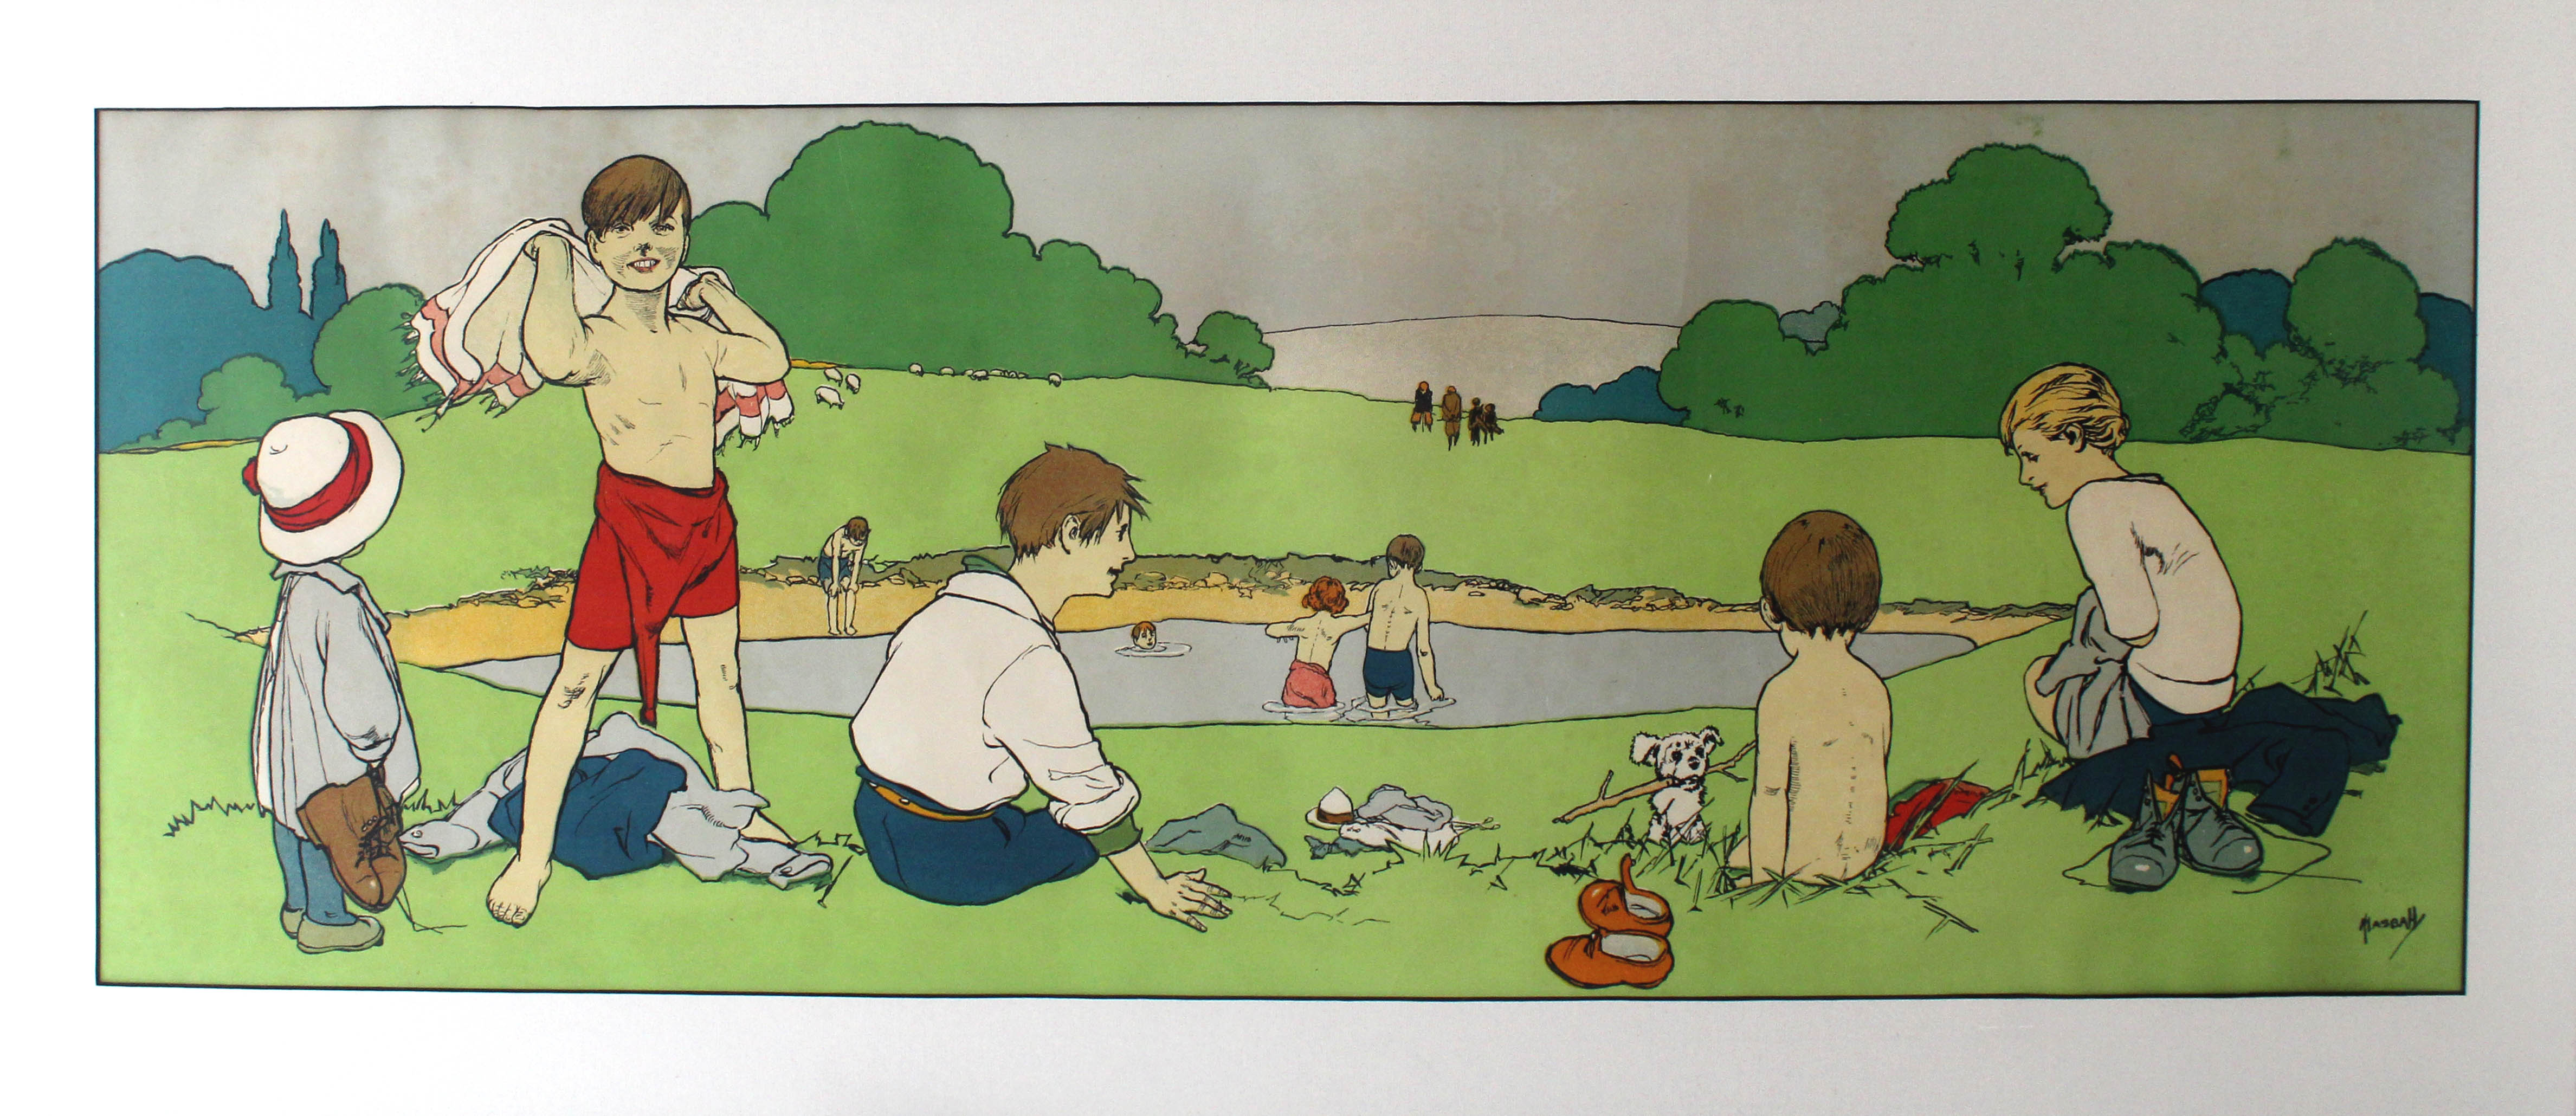 Advertising Poster Activities for Children Victorian Hassall - Image 2 of 5